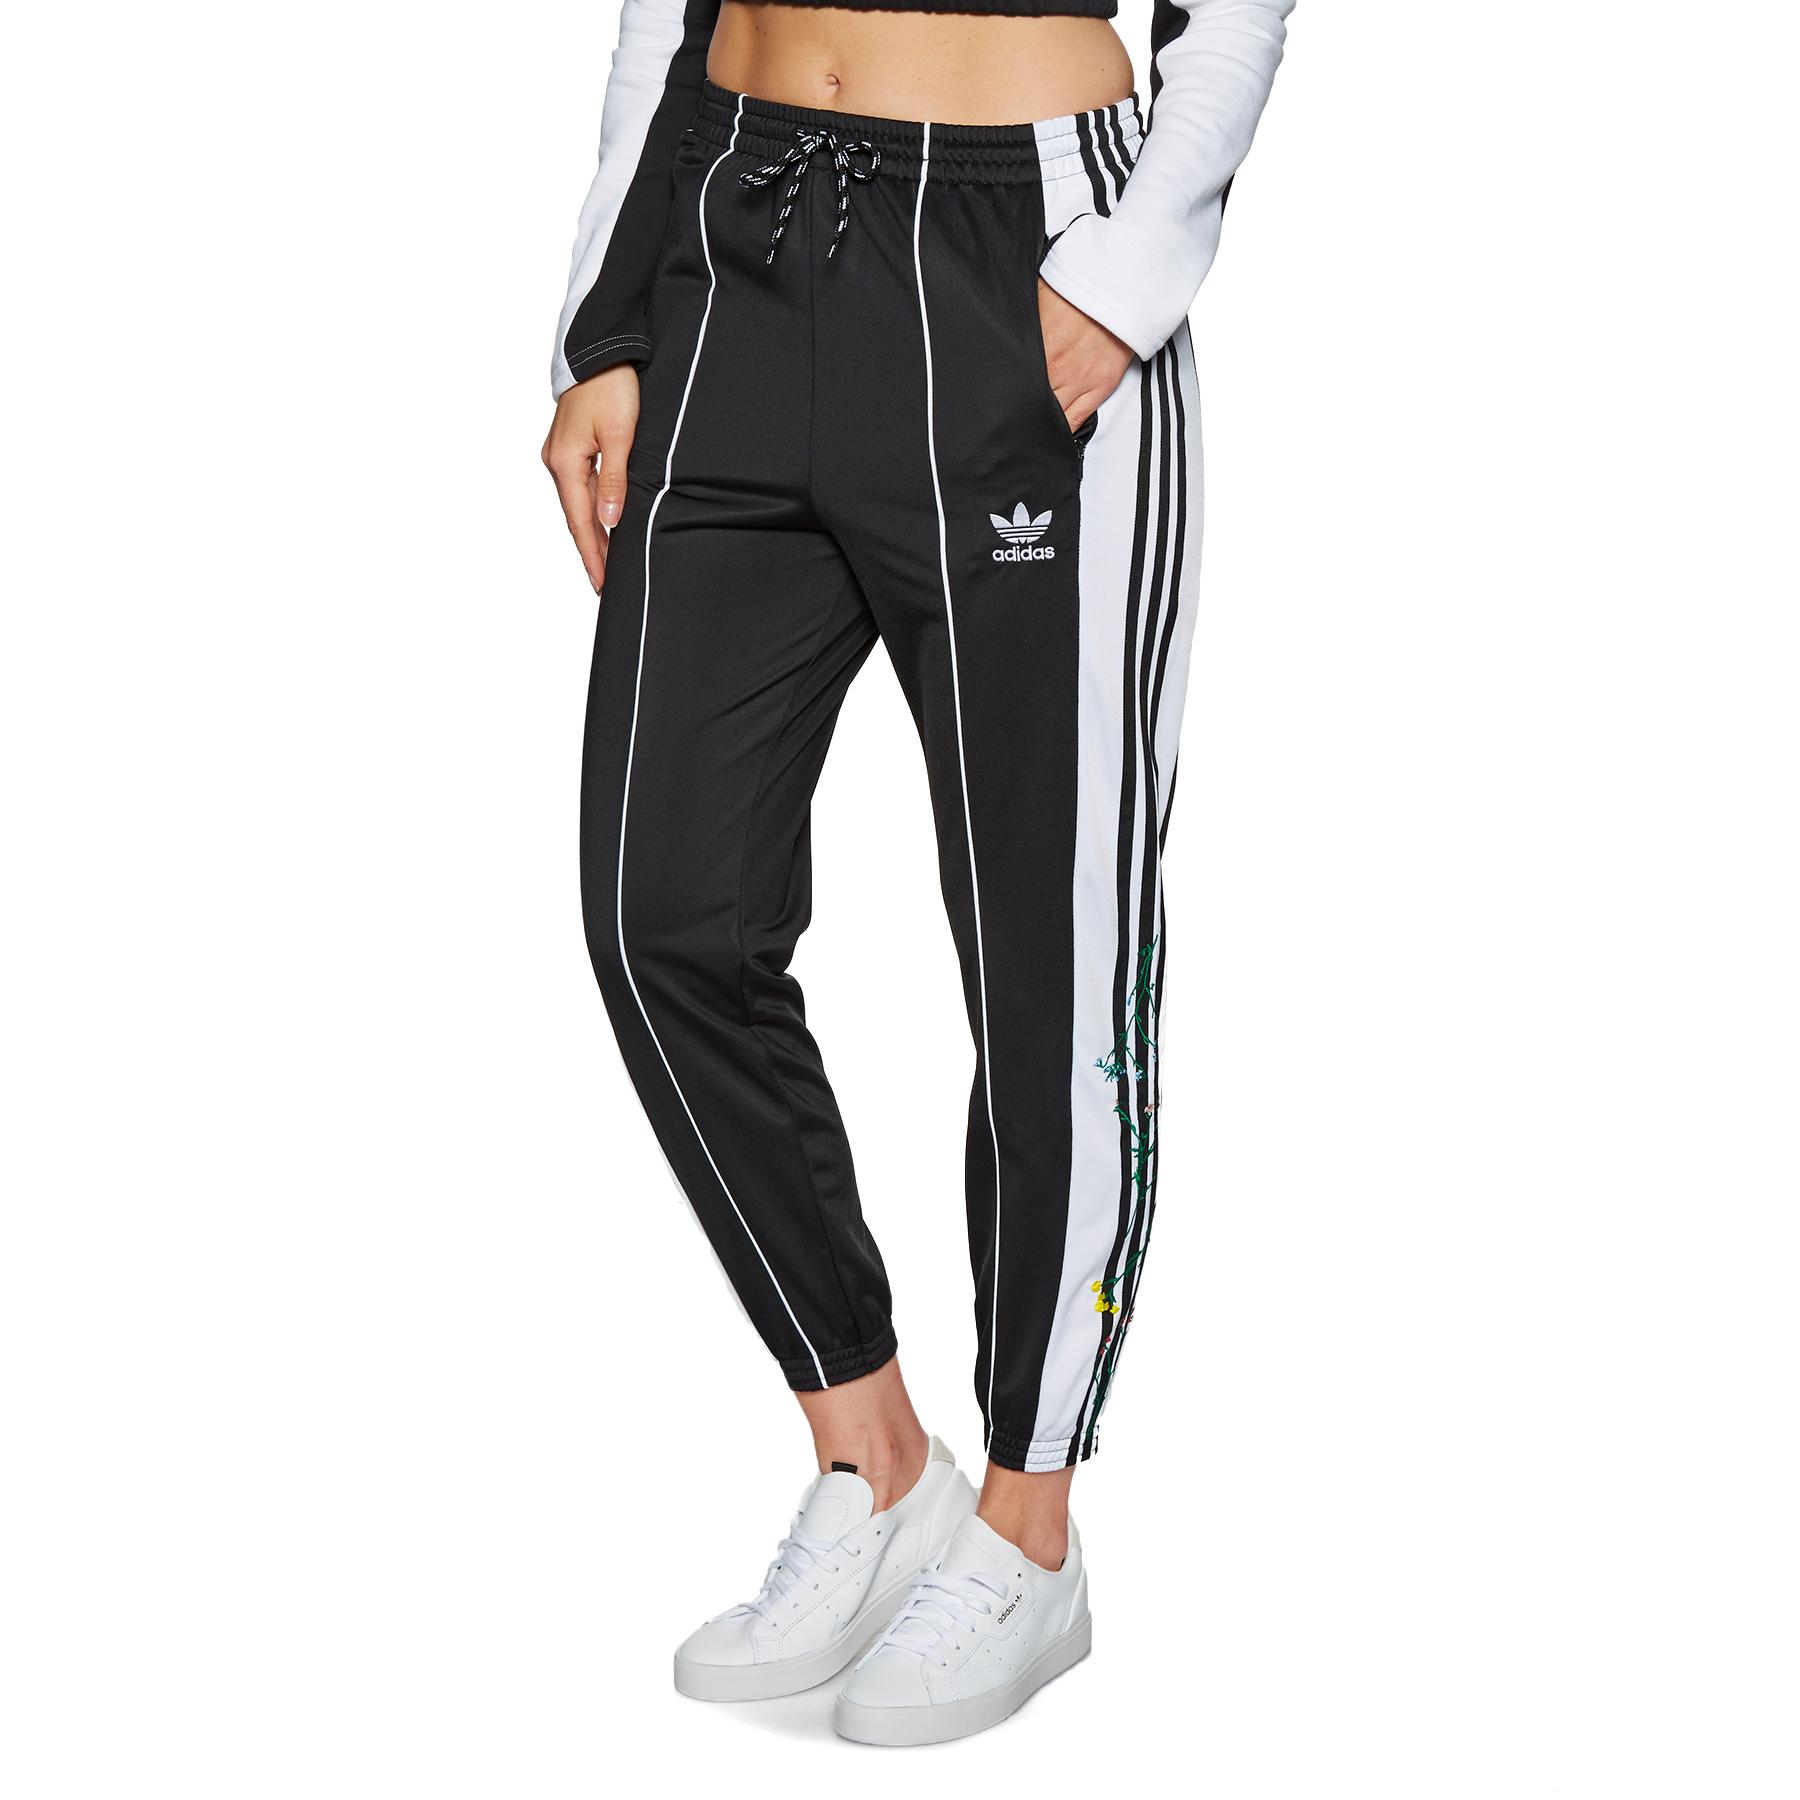 adidas women's jogging pants